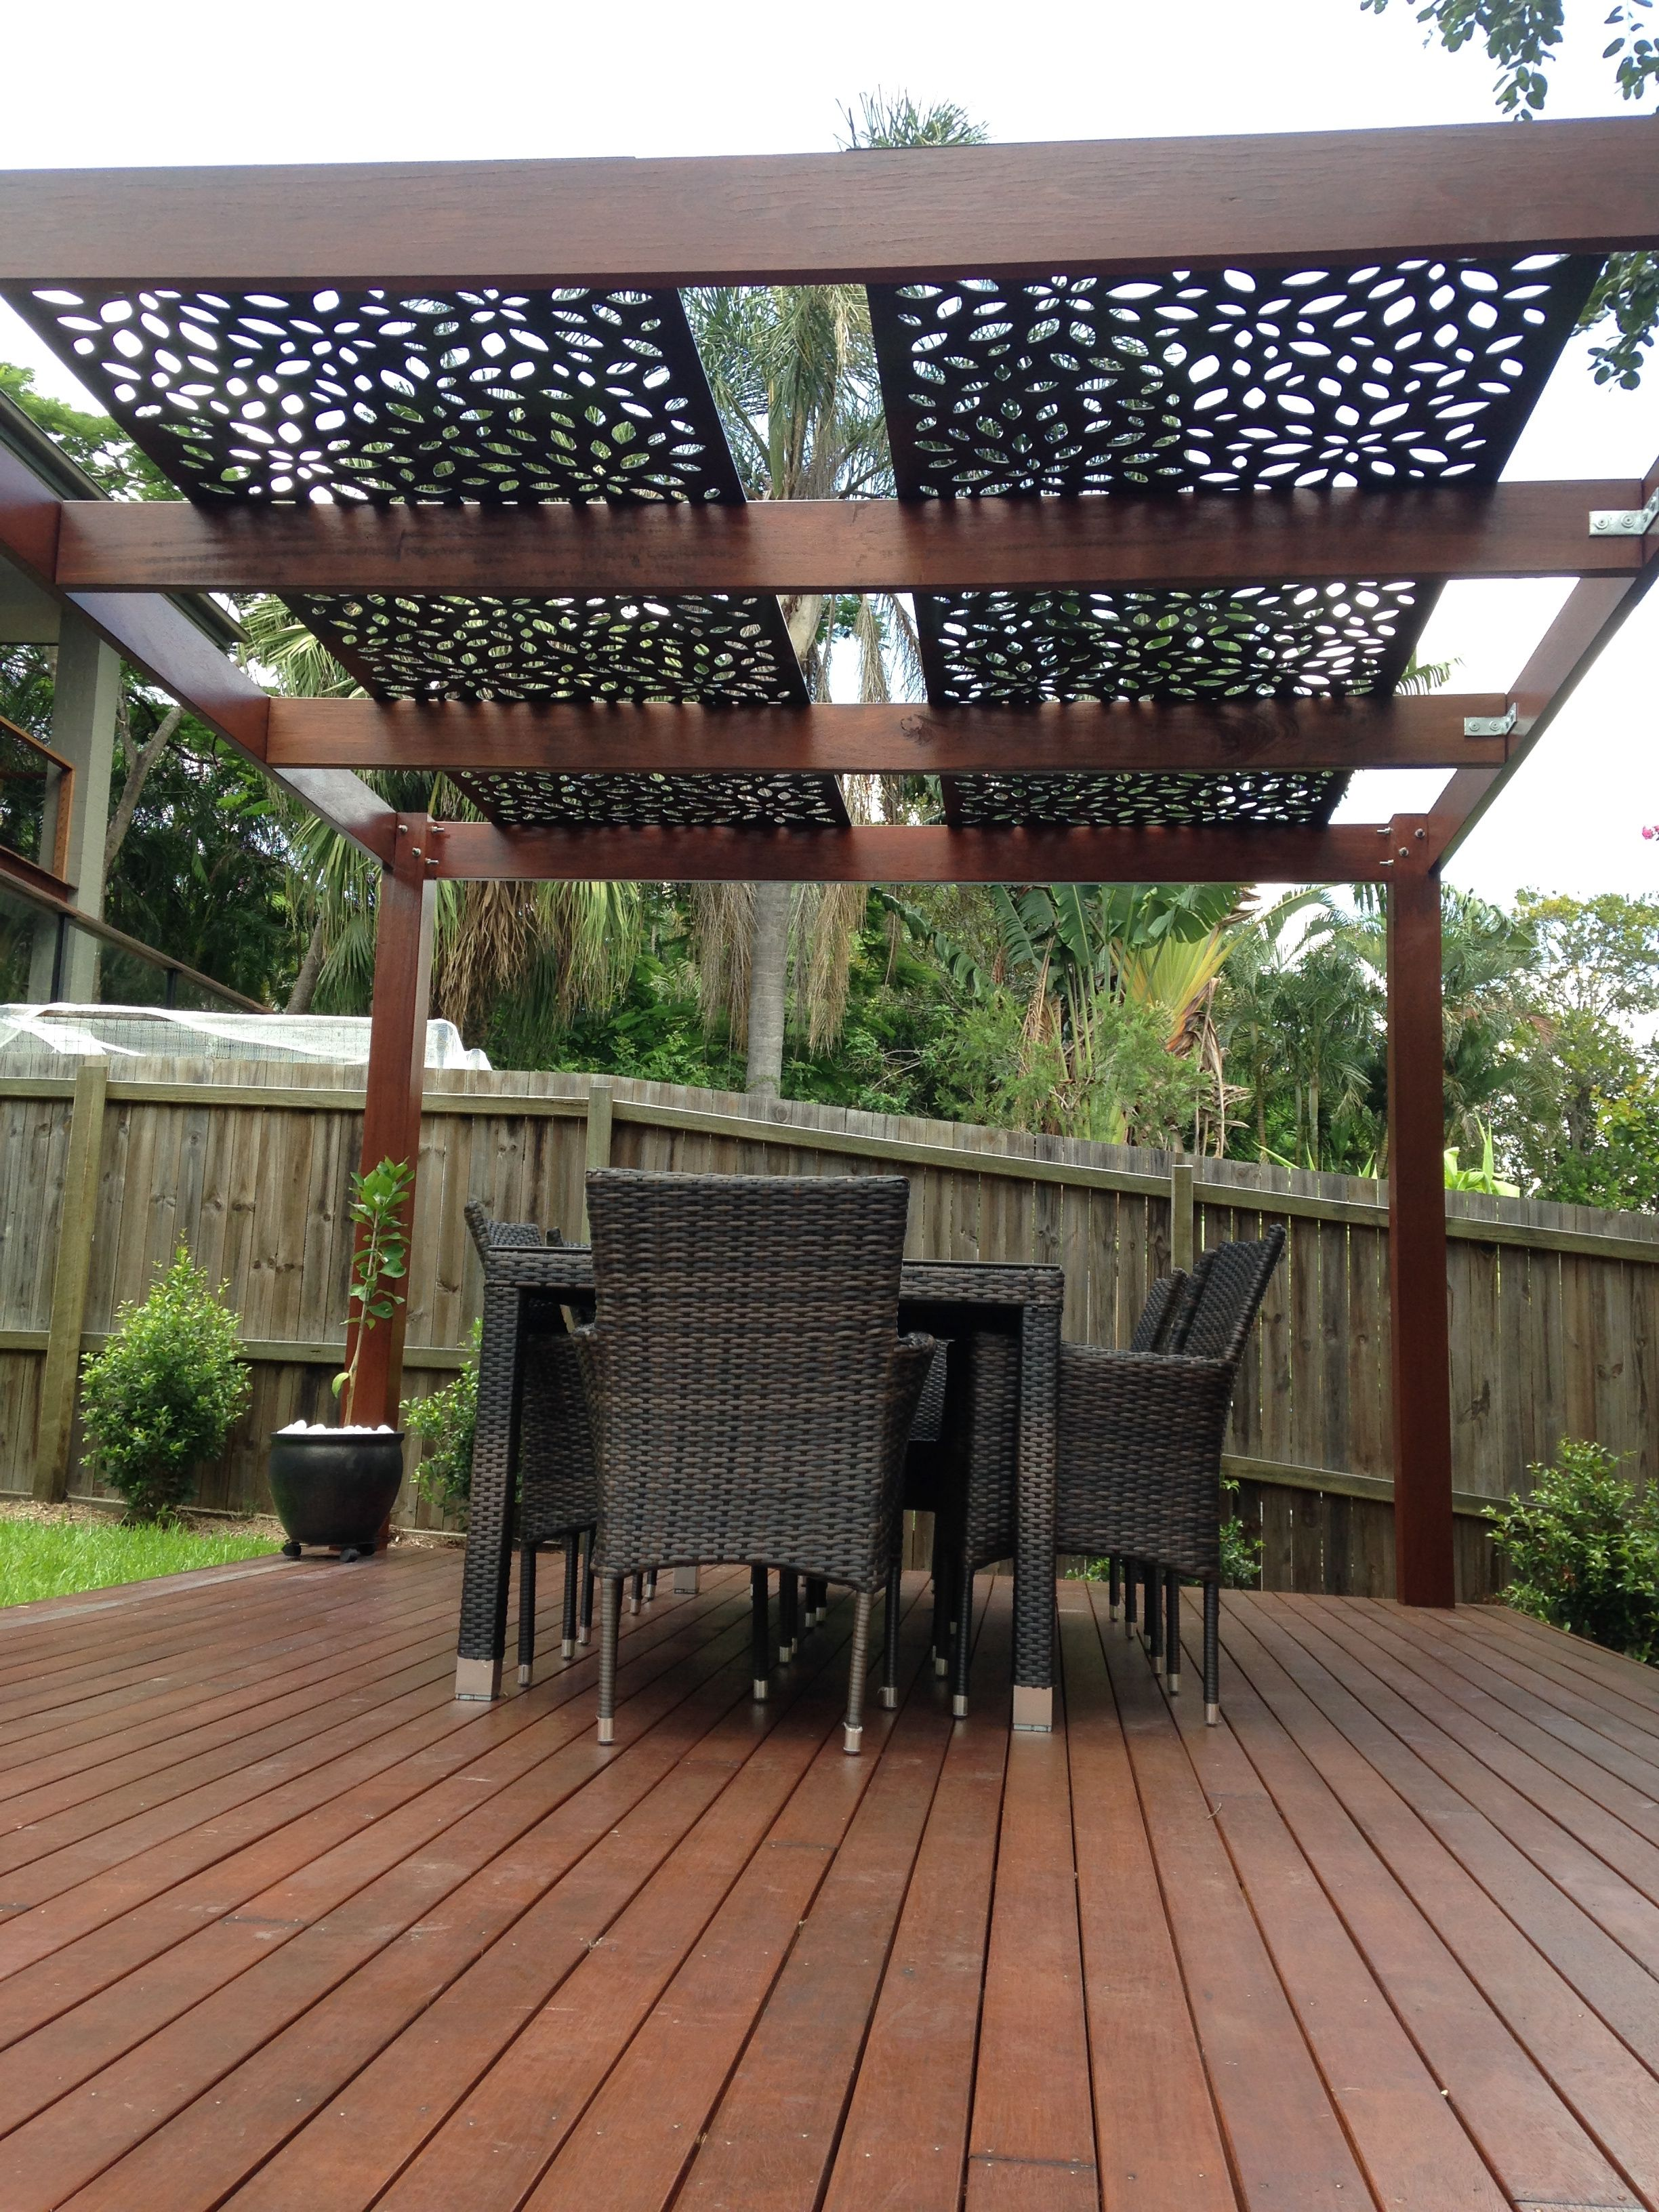 decorative screening on pergola roof privacy screens brisbane call today 0430 192 209. Black Bedroom Furniture Sets. Home Design Ideas